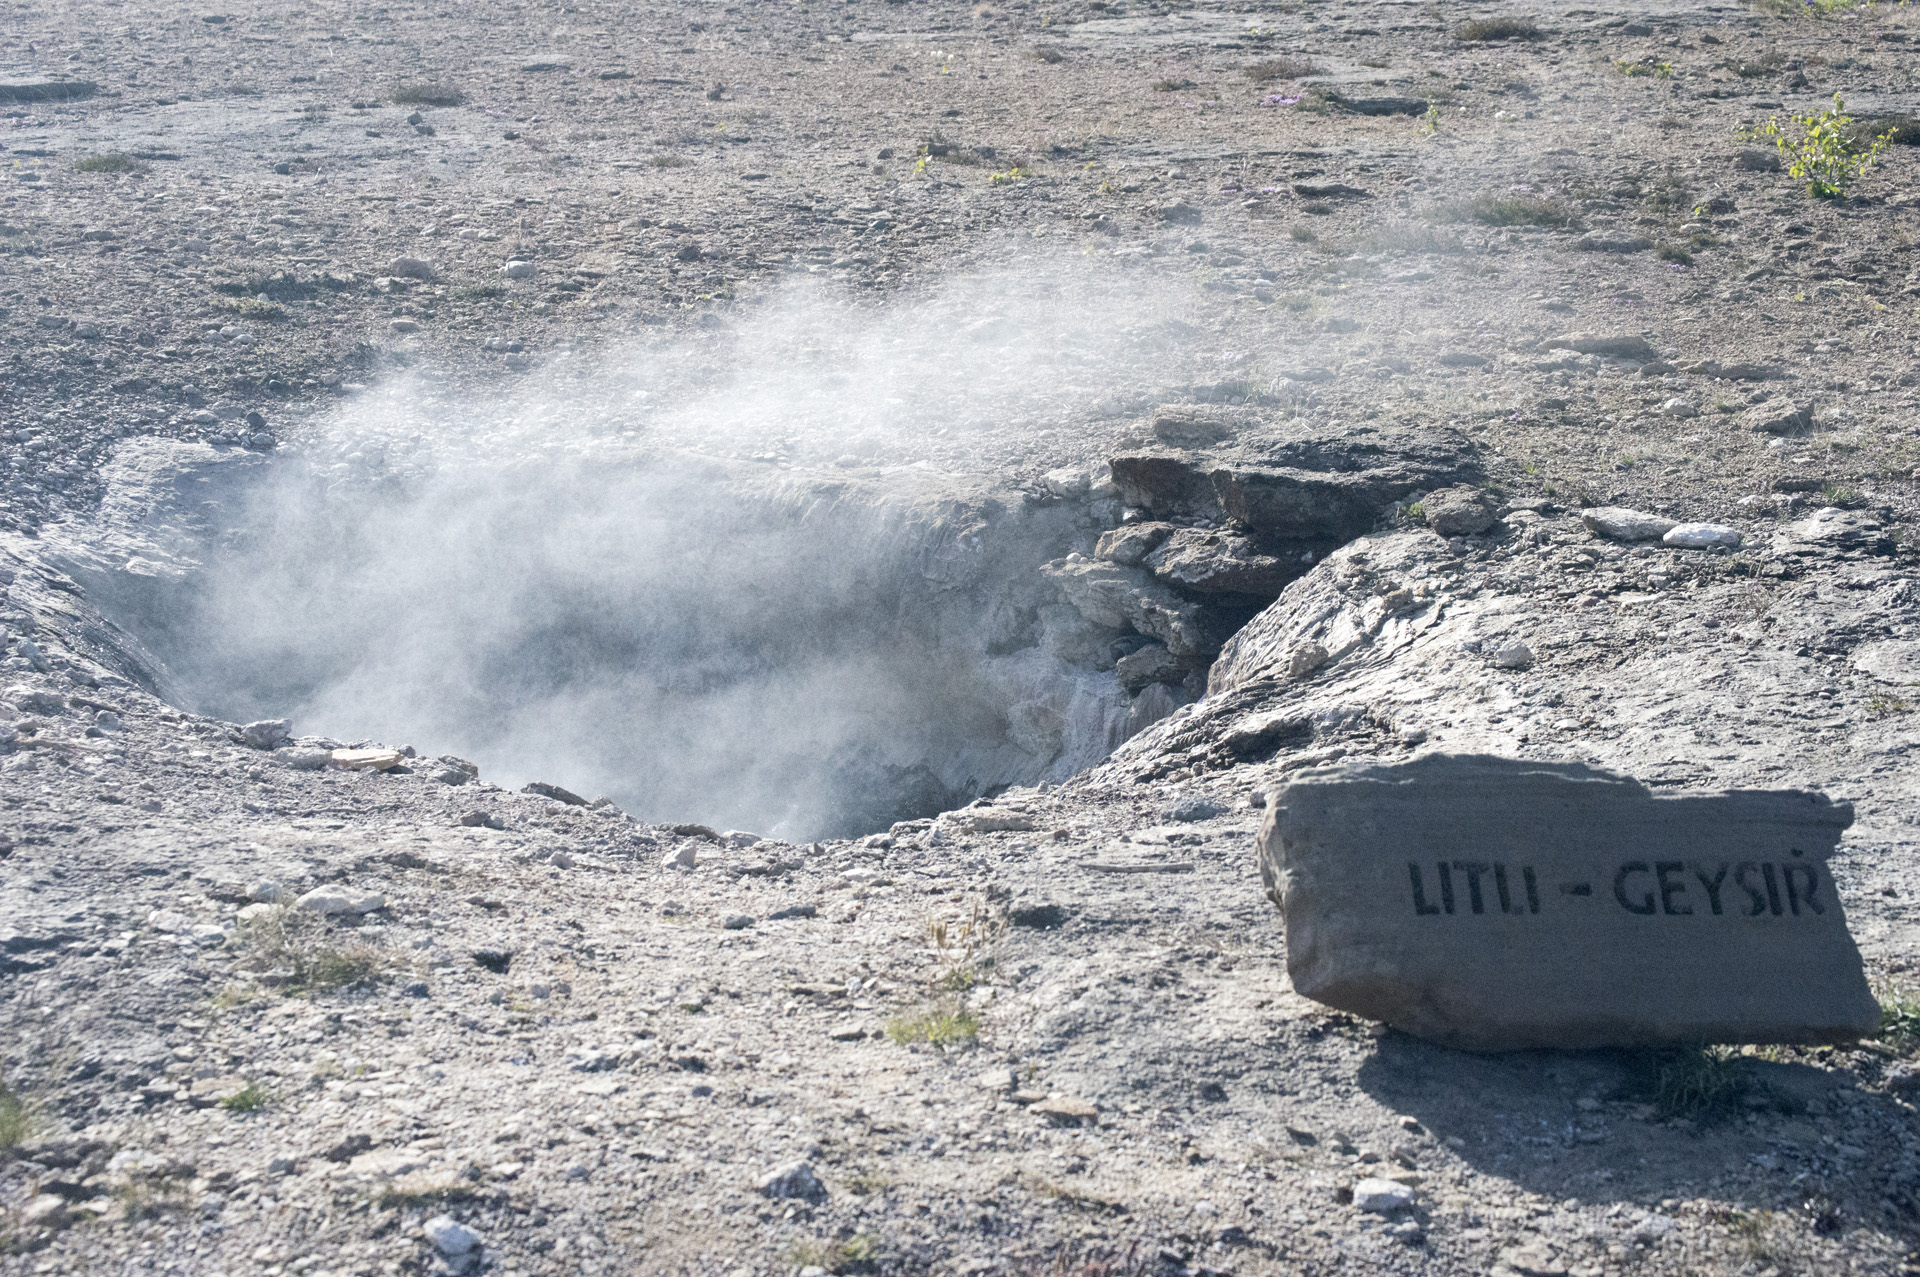 Litli Geysir (Little Geyser) in the Geysir Hot Spring Area in the Haukadalur Valley, Iceland.